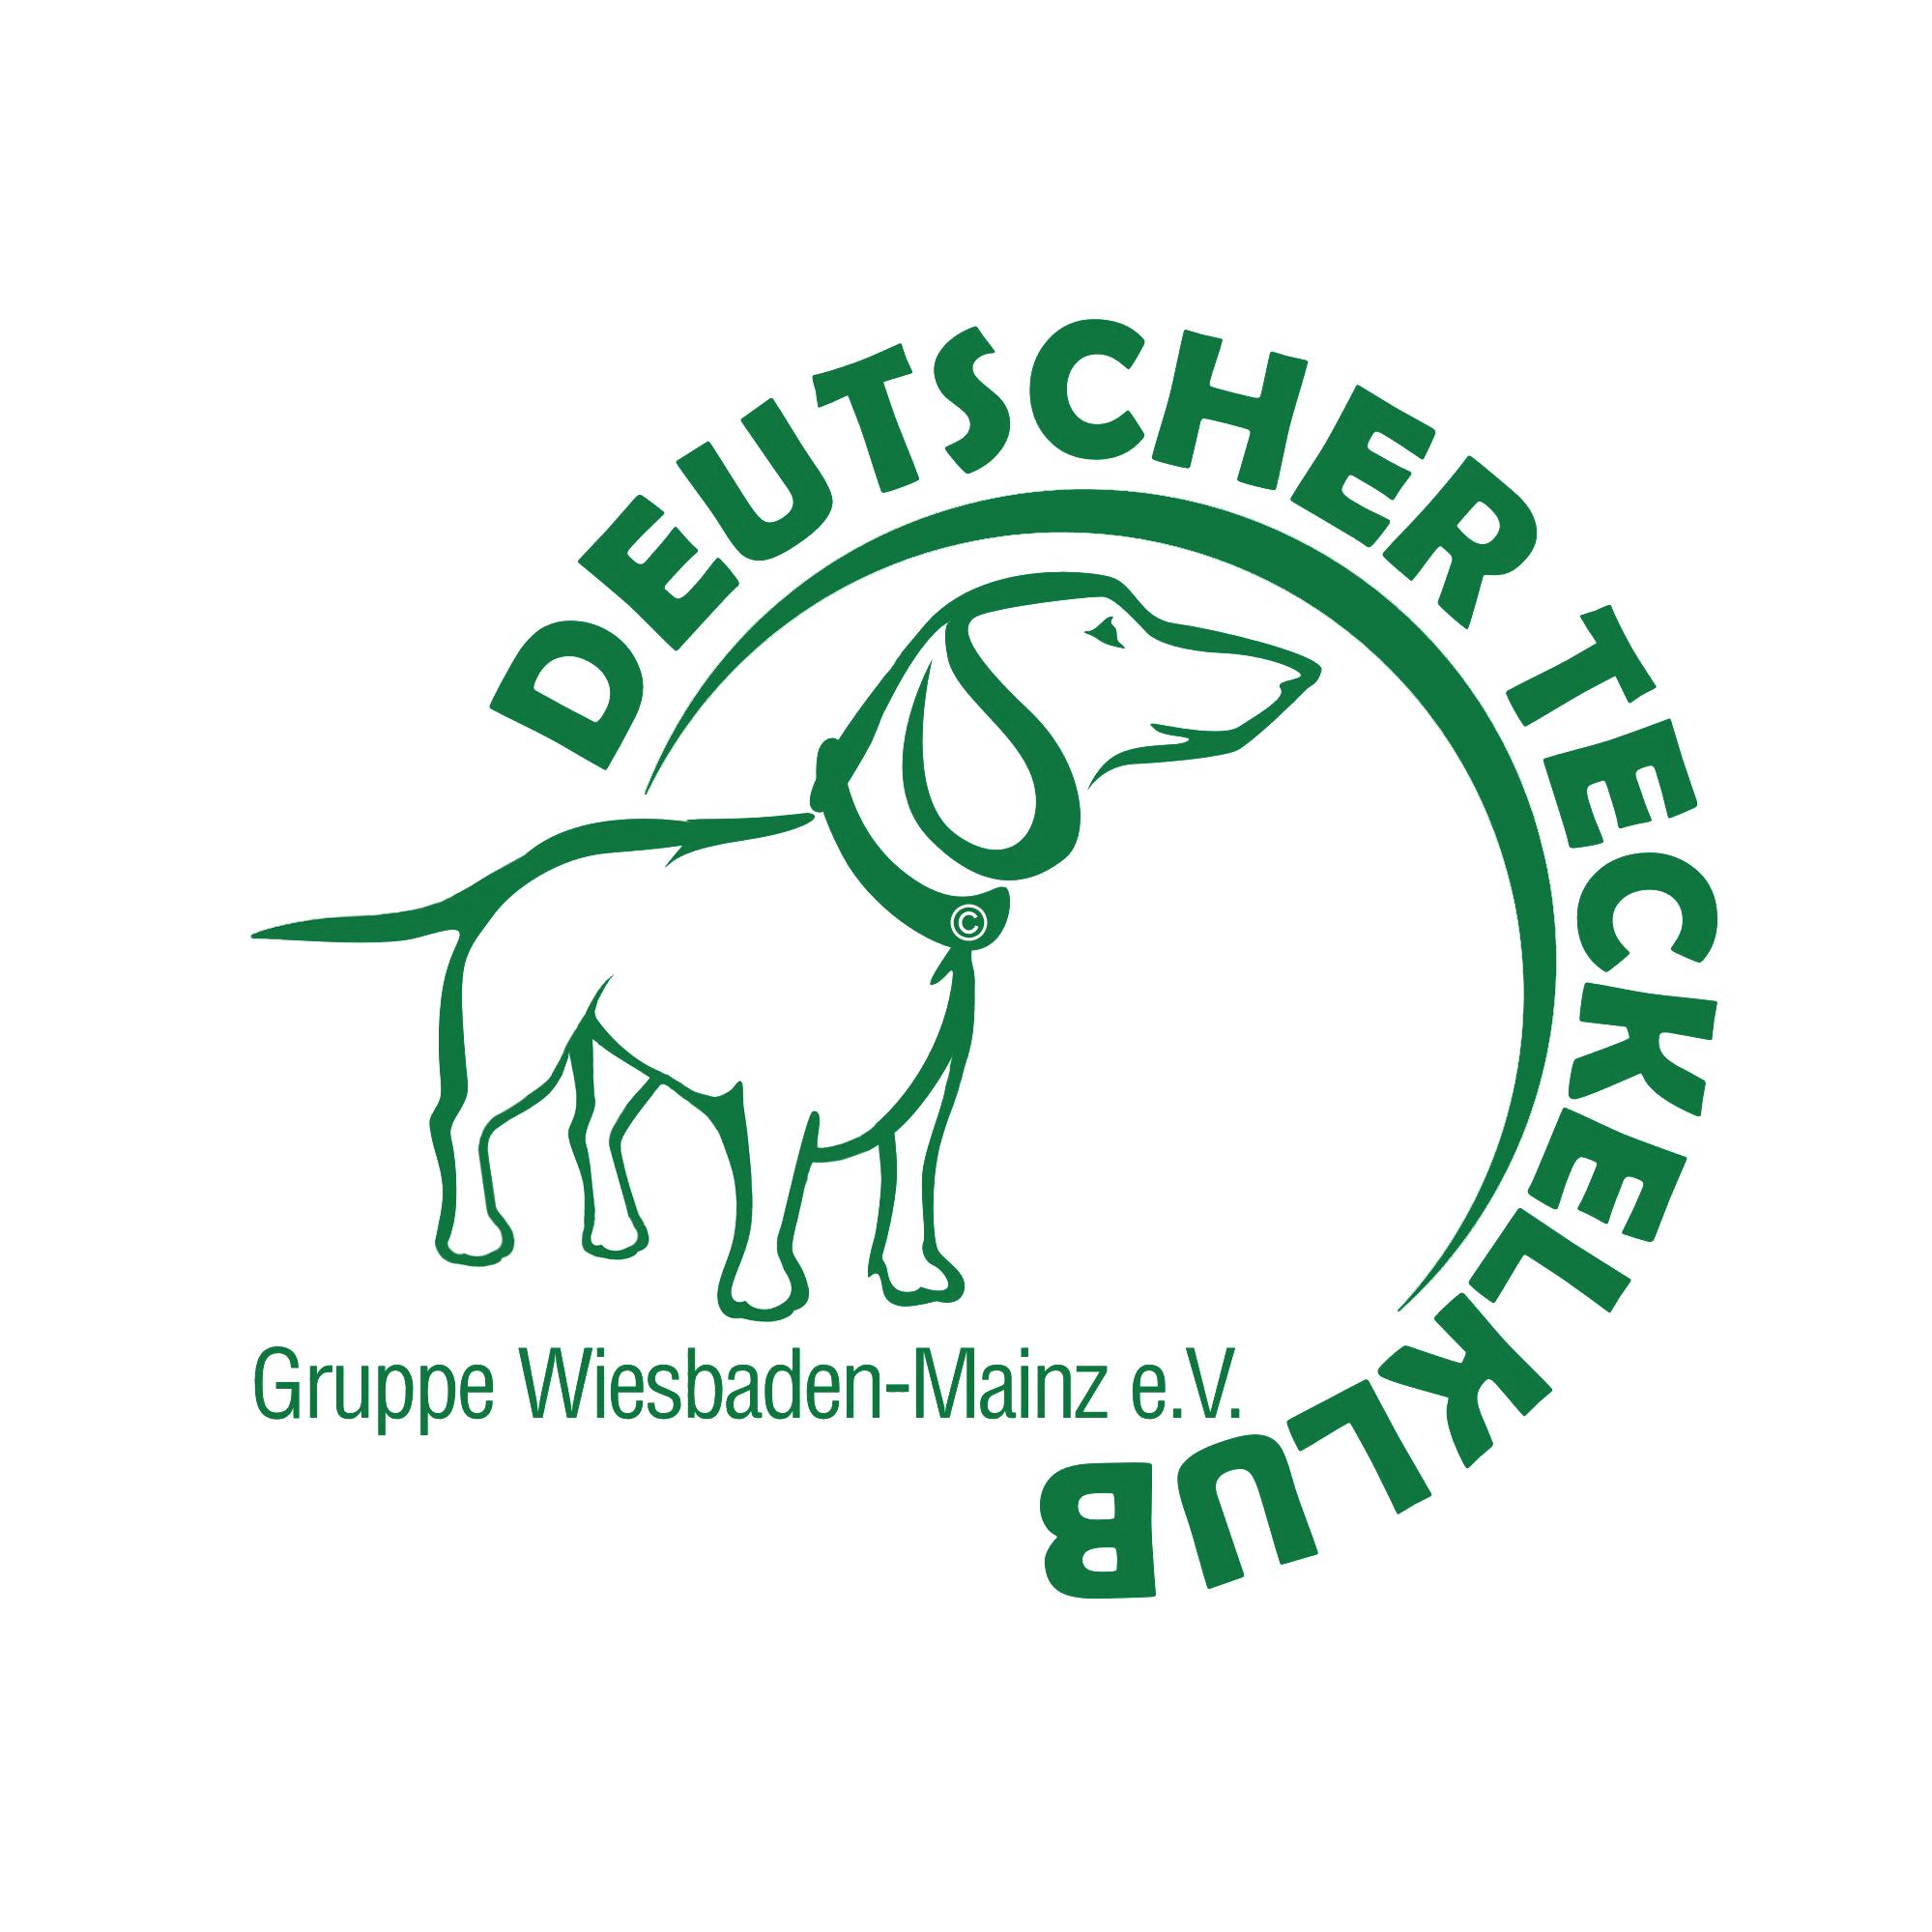 https://teckelklub-wiesbaden-mainz.de/wp-content/uploads/2018/01/Logo-WI-MZ-C-Endprodukt.jpg